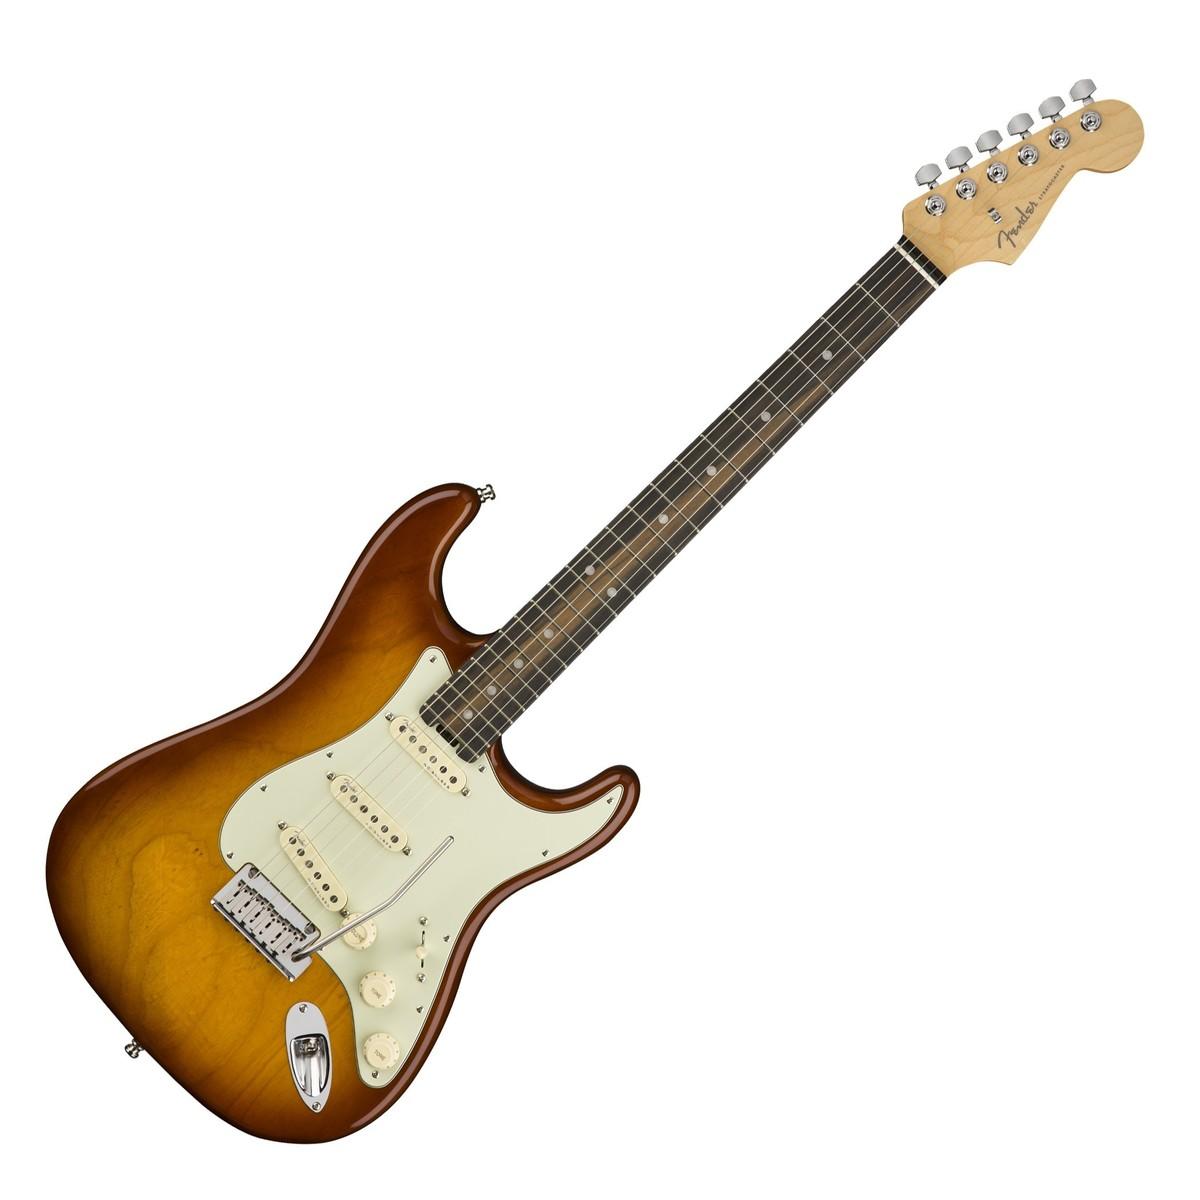 Fender american elite stratocaster ebony